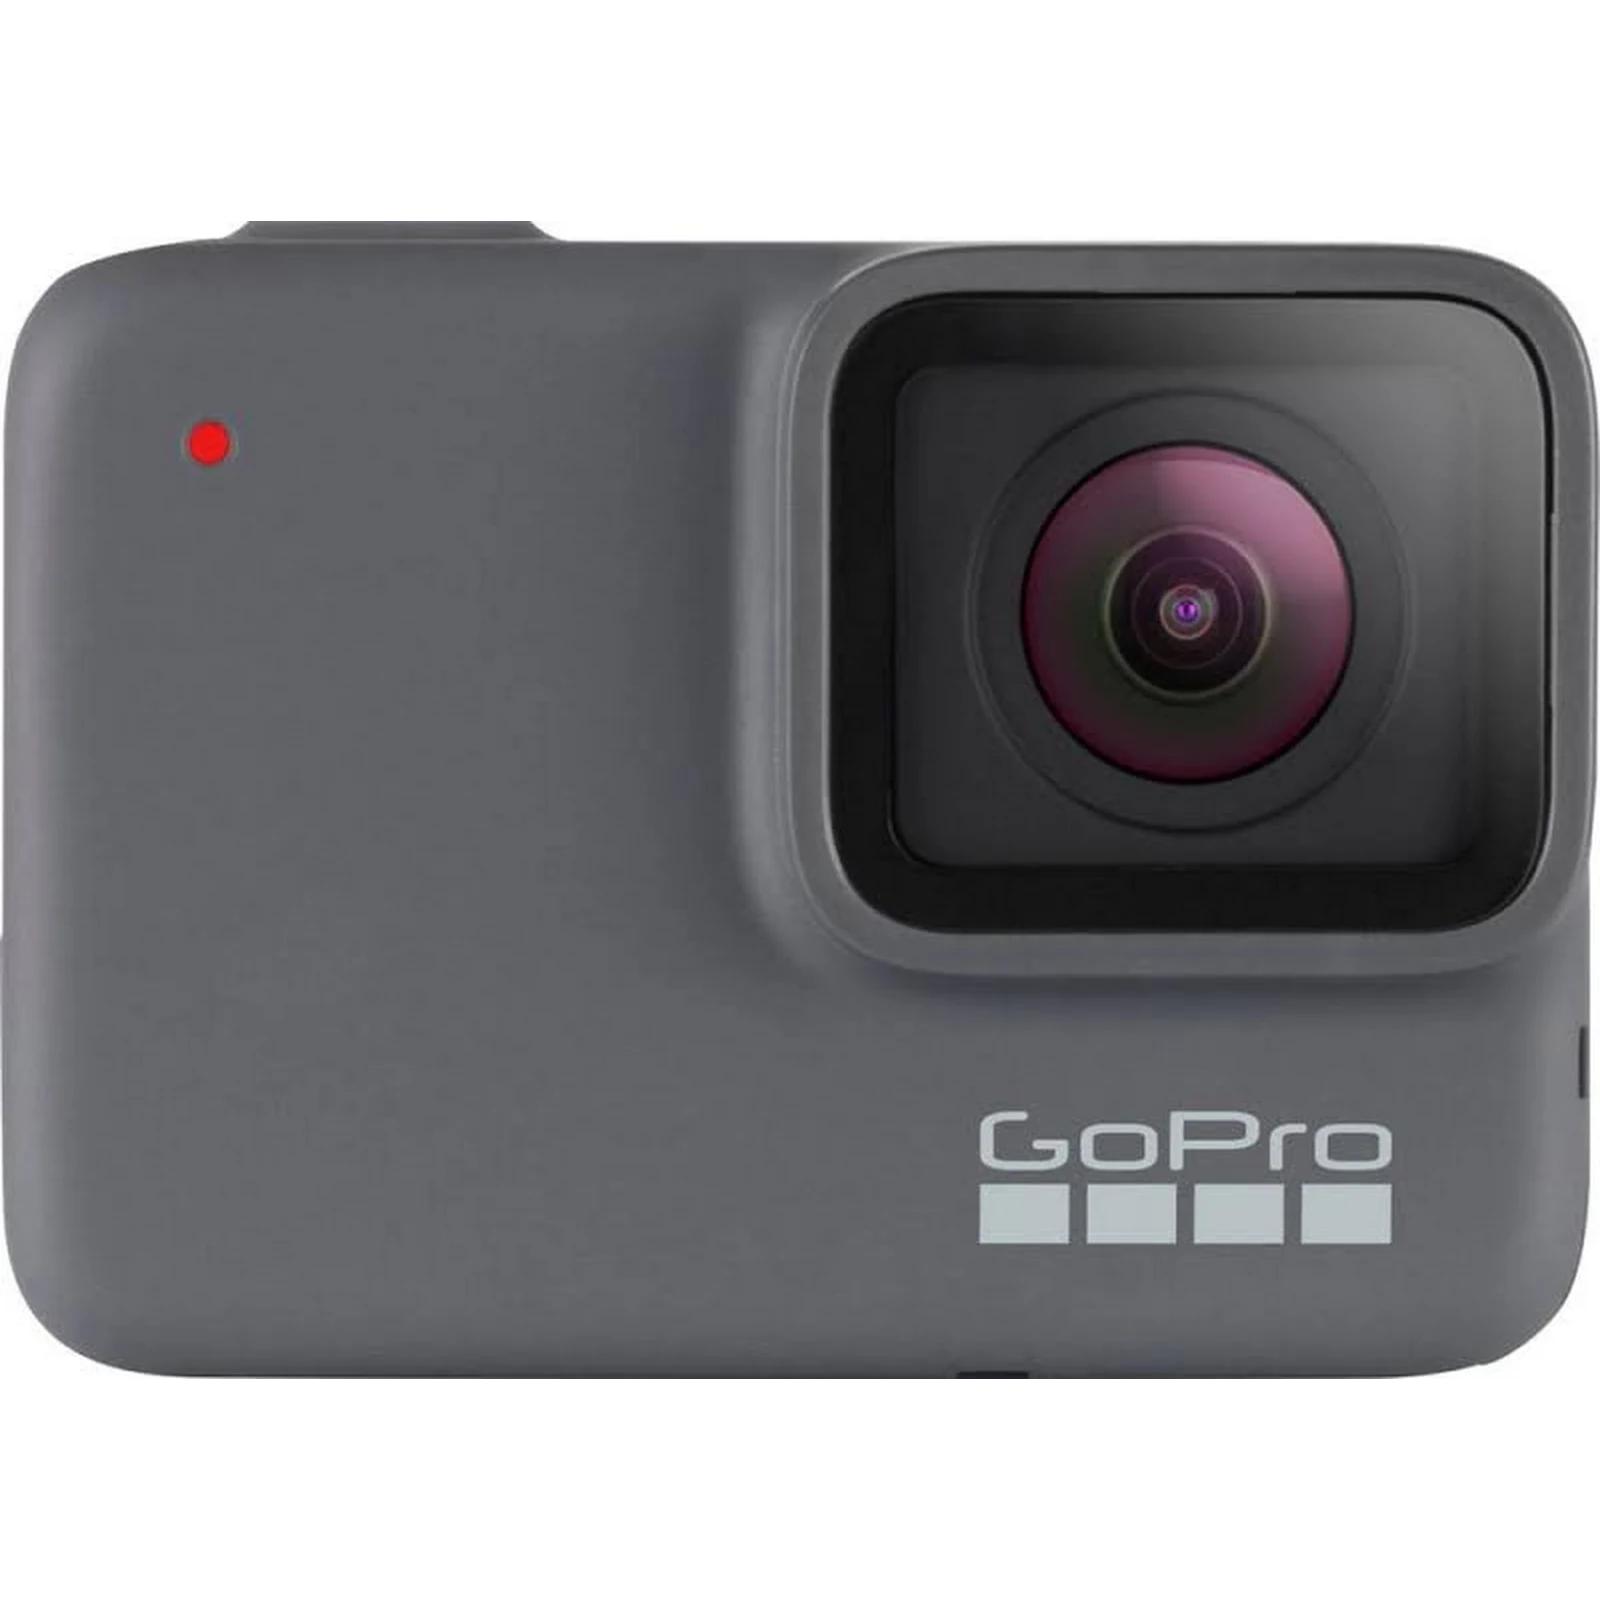 GoPro HERO7 Silver 4K Action Camera $180 + free s/h